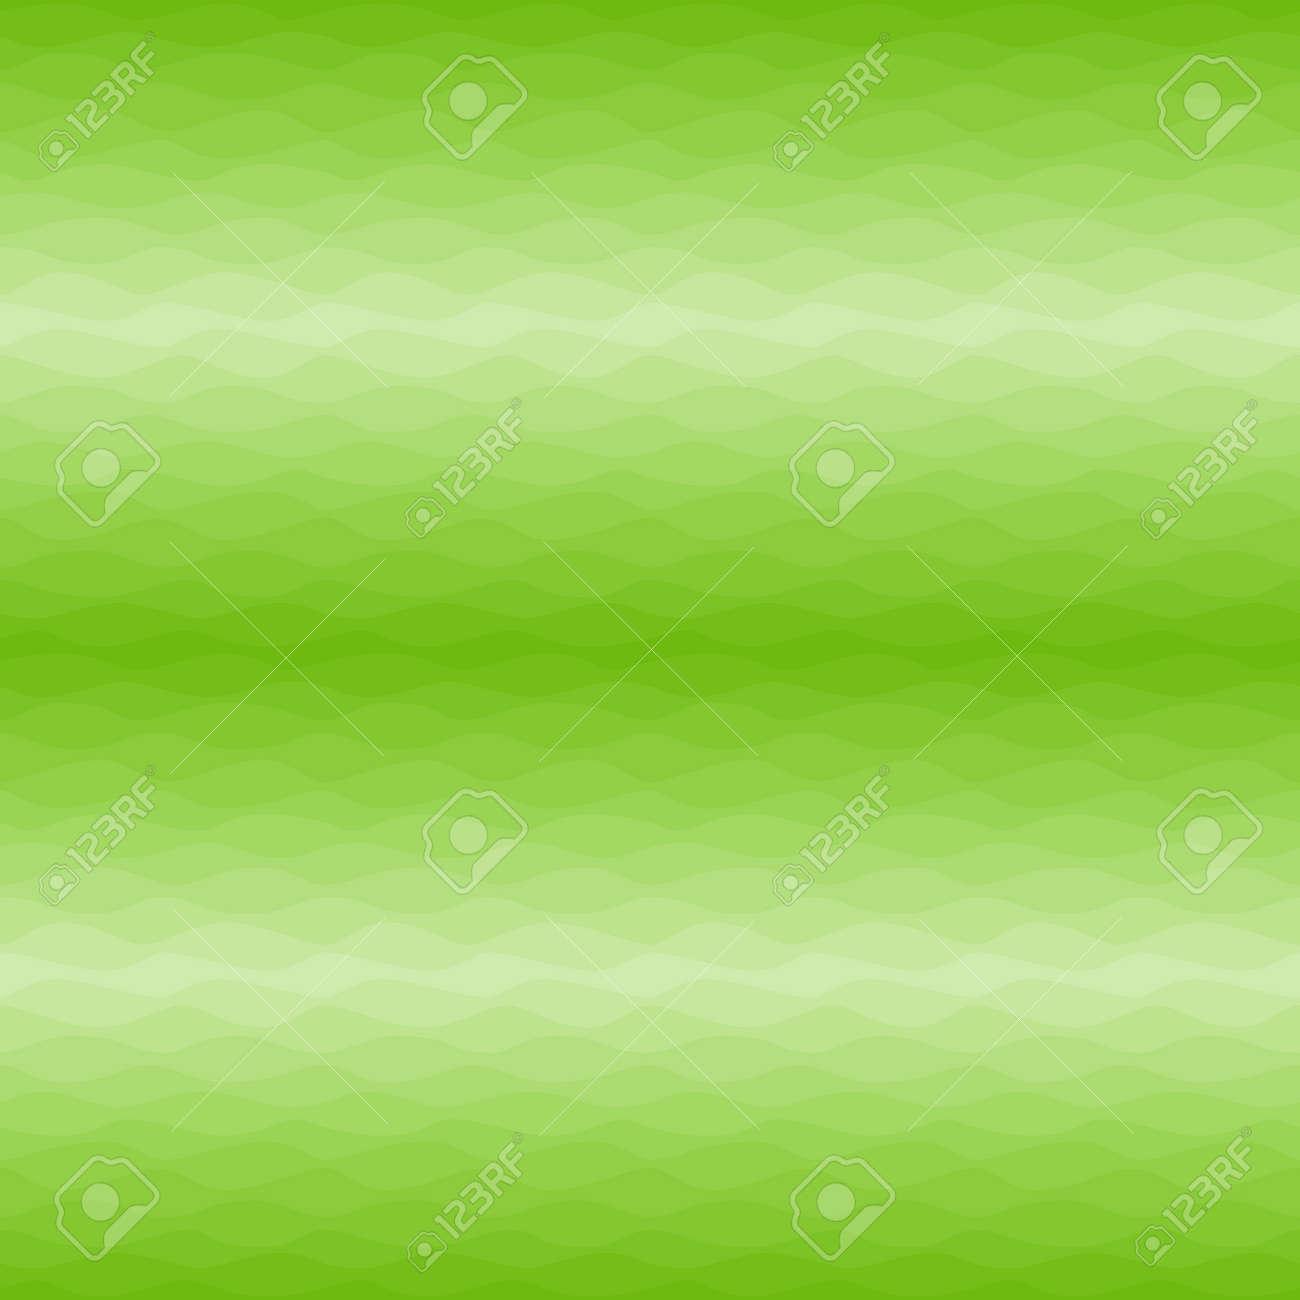 Gradual wavy yellow green background - 164334466